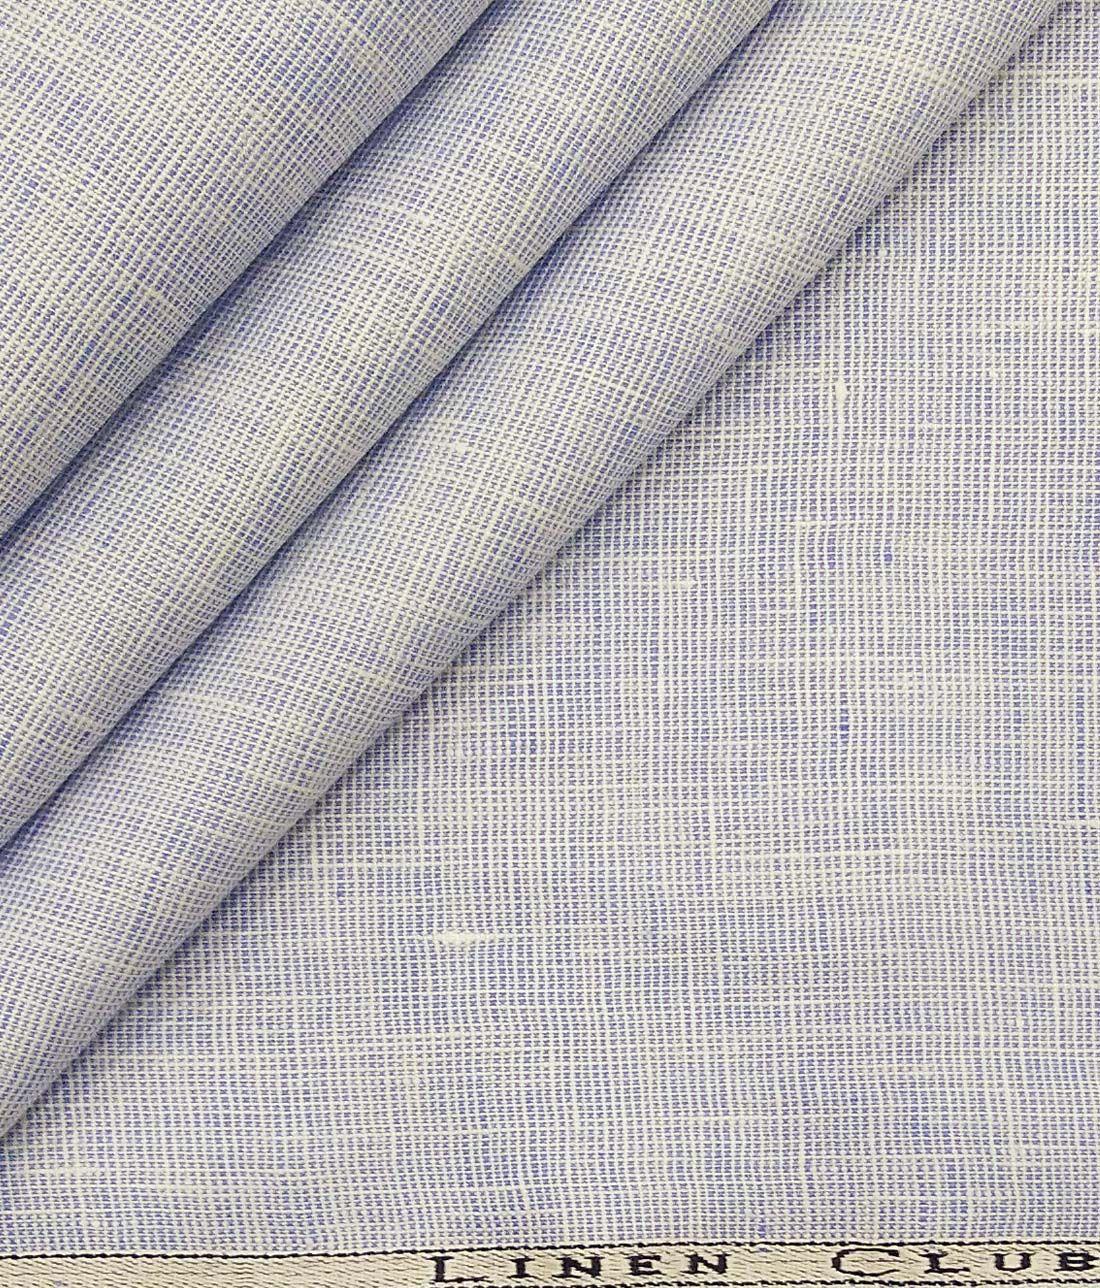 Linen Club White Blue Structured 100 Pure Linen Shirt Fabric 1 60 M Fabric Pure Linen Fabric Online